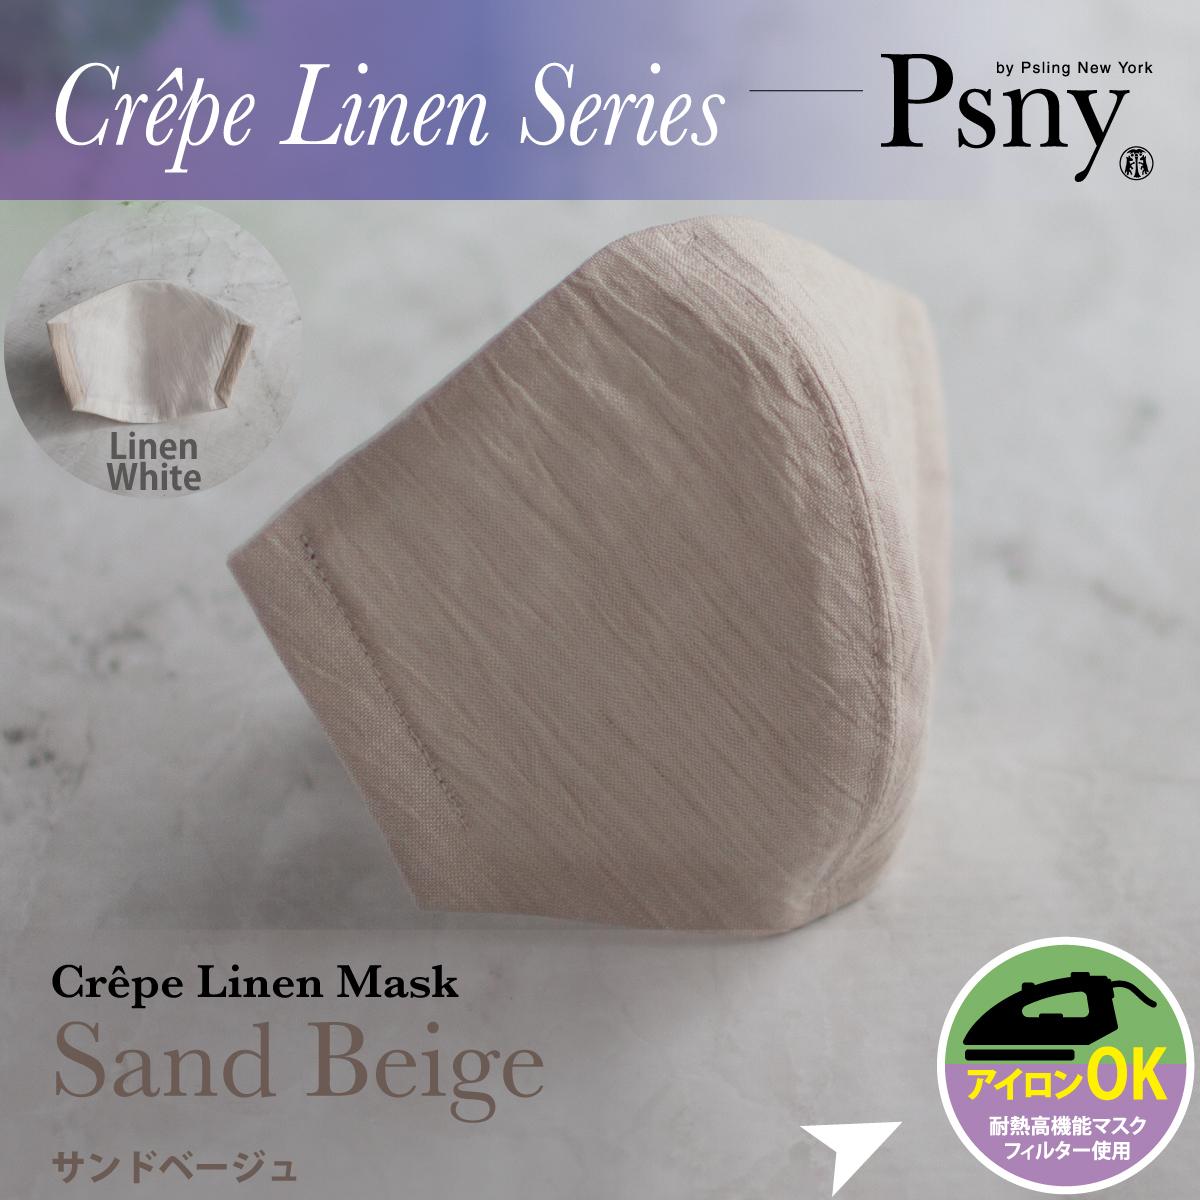 PSNY クレープリネン・サンドベージュ 花粉 黄砂 洗えるフィルター入り 立体 マスク 大人用 送料無料